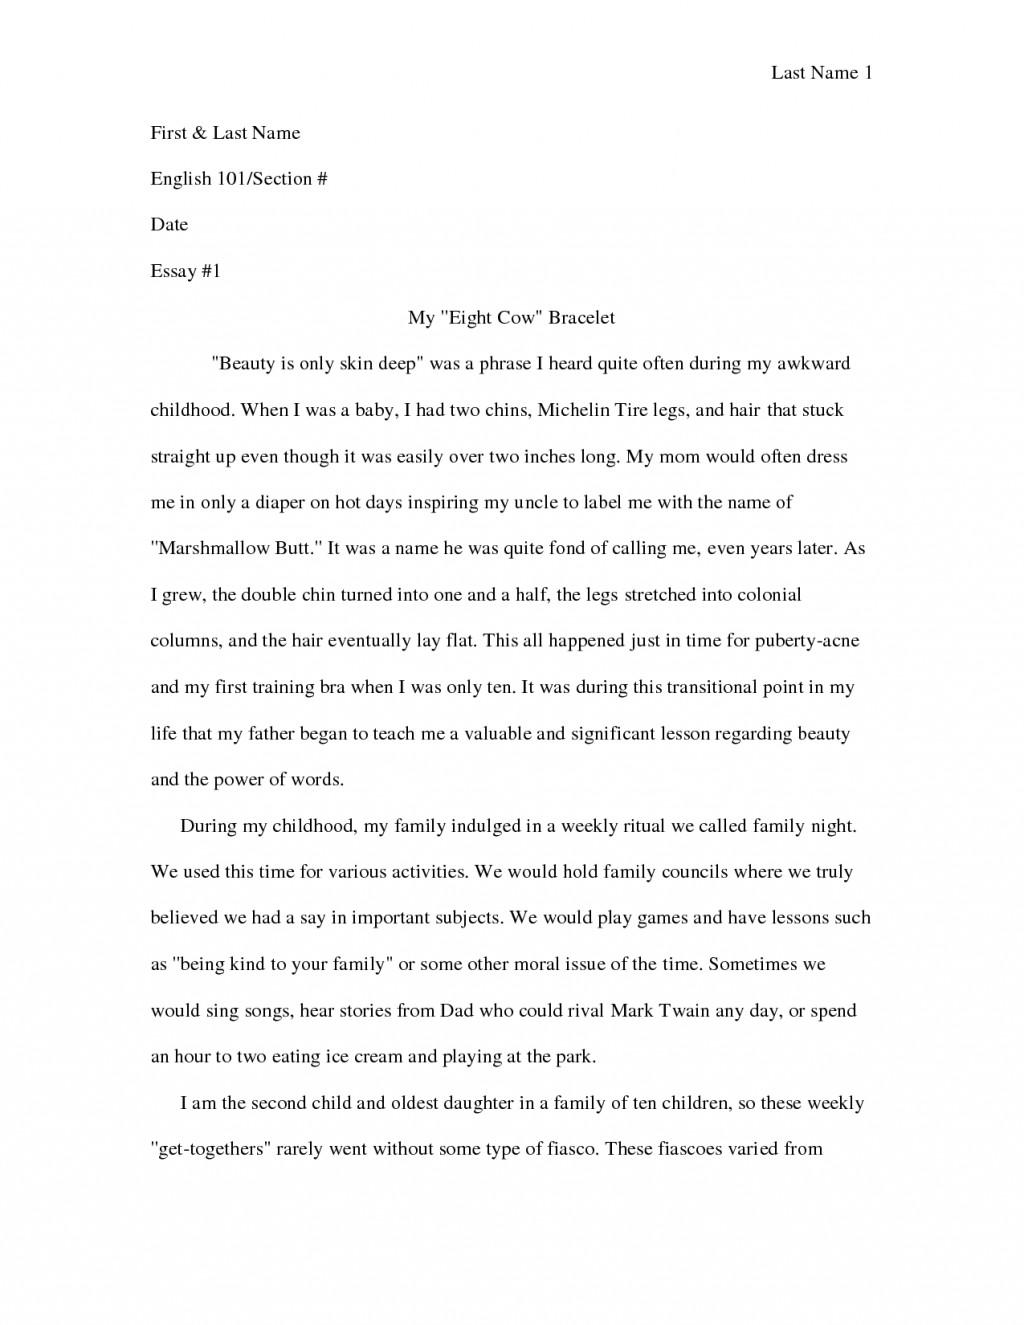 005 My Favorite Memory Essay High School Childhood Memories Narrative Example Cover Top Ideas Earliest Large